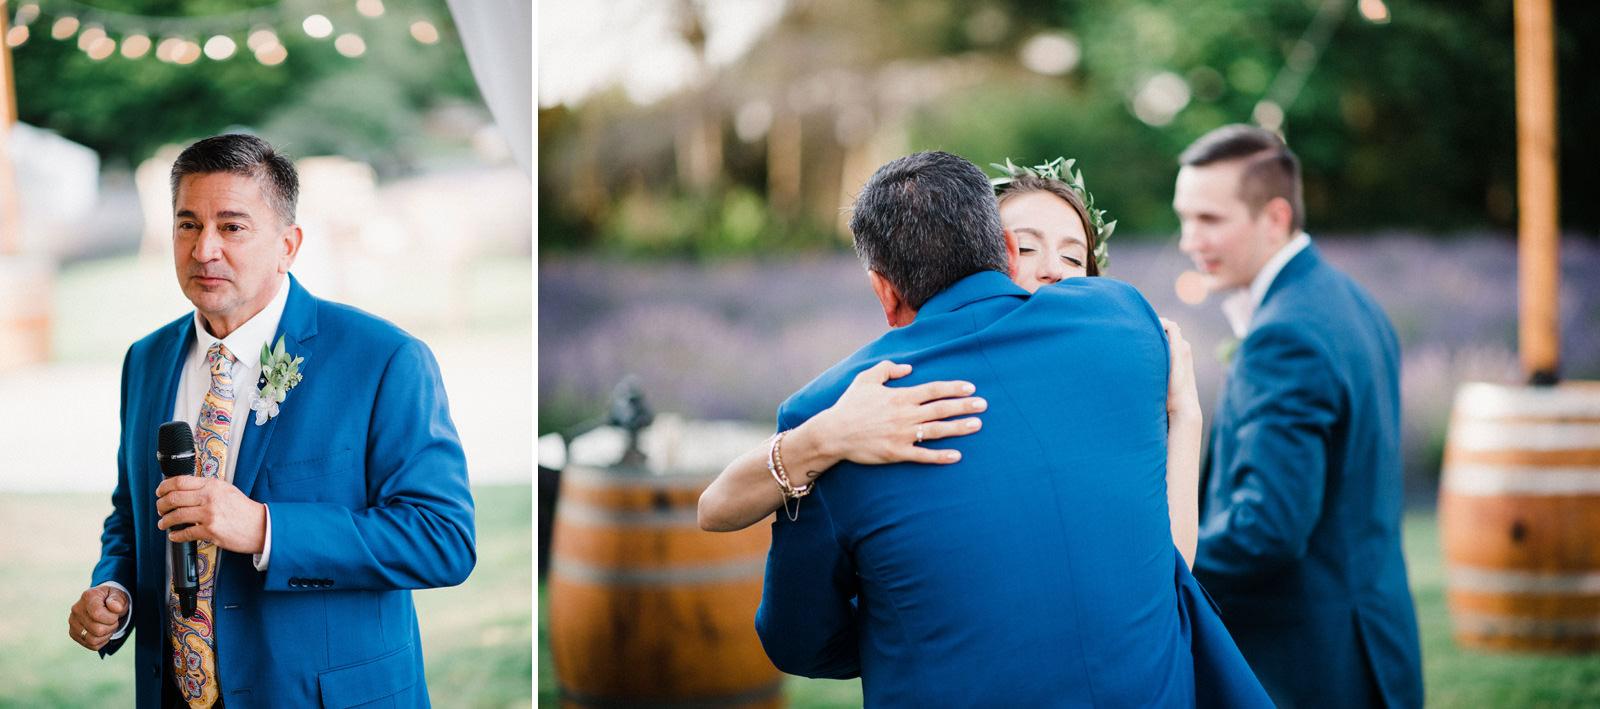 072-woodinville-lavendar-farm-wedding-with-golden-glowy-photos.jpg